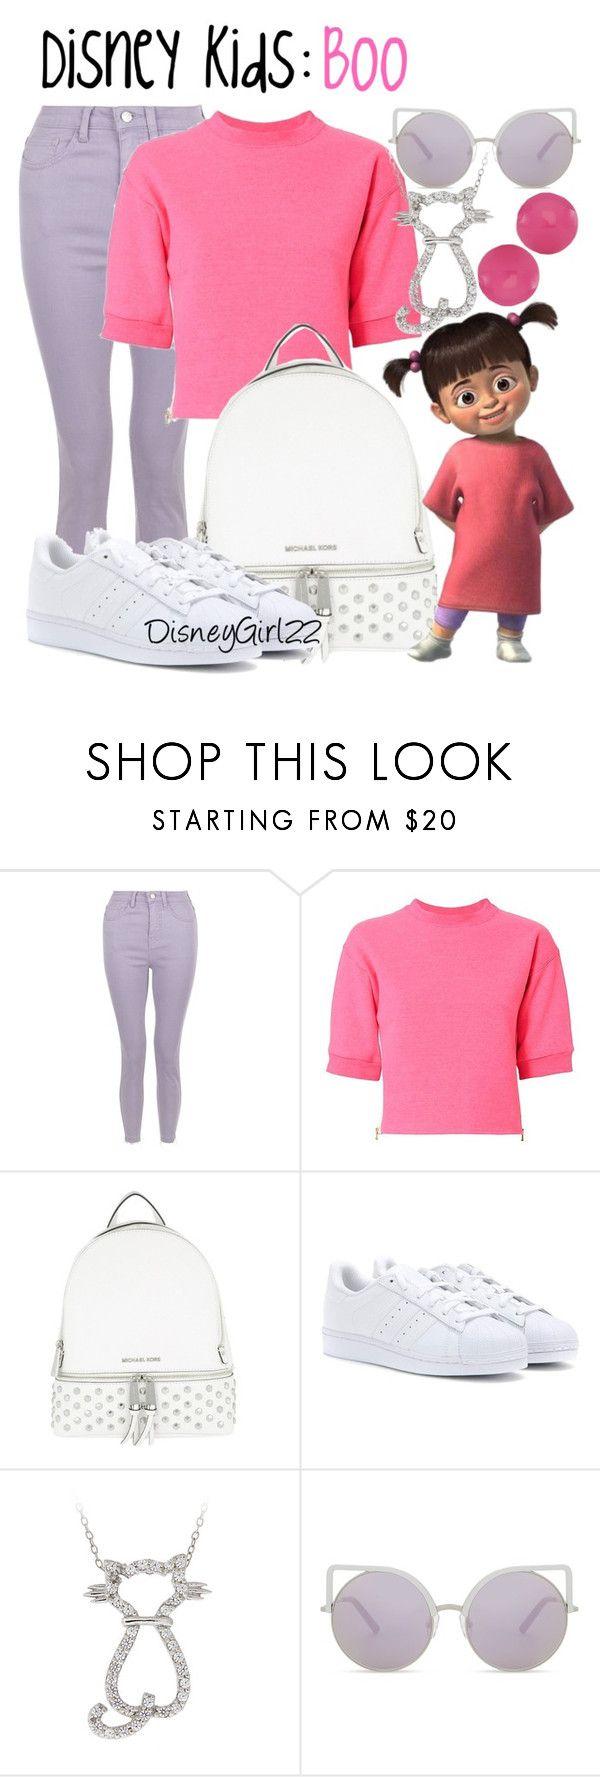 """Disney Kids: Boo"" by disneygirl22 ❤ liked on Polyvore featuring Harvey Faircloth, MICHAEL Michael Kors, adidas Originals, Icz Stonez, Matthew Williamson, Kim Rogers, disney, Boo, monstersinc and disneybound"